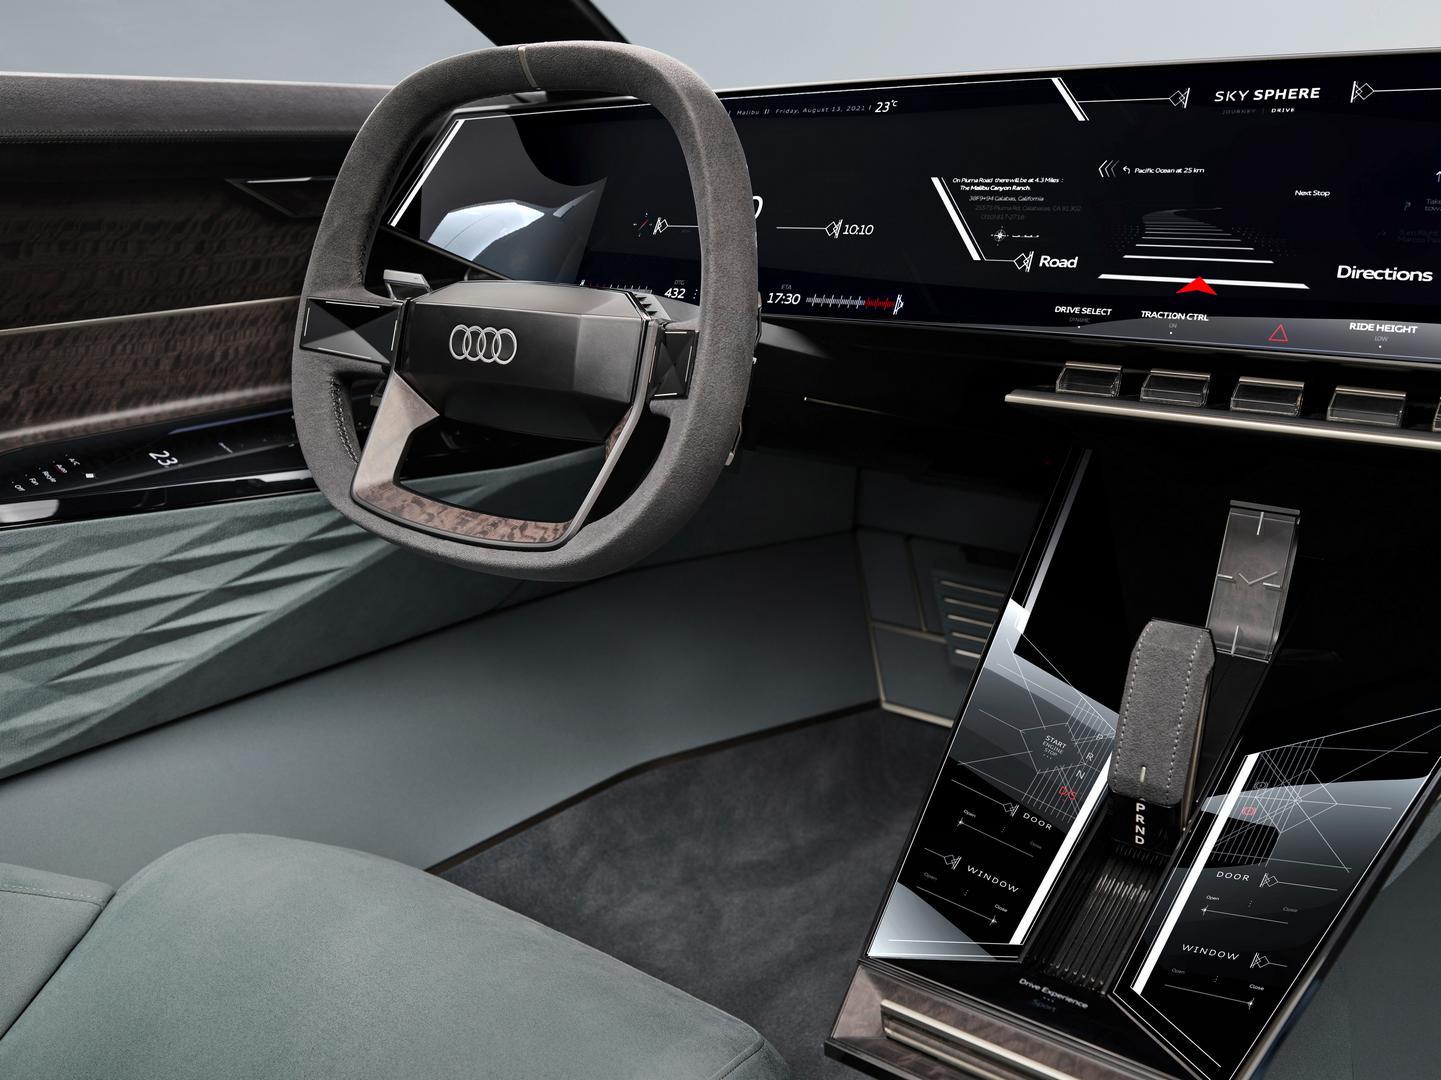 Audi skysphere interior